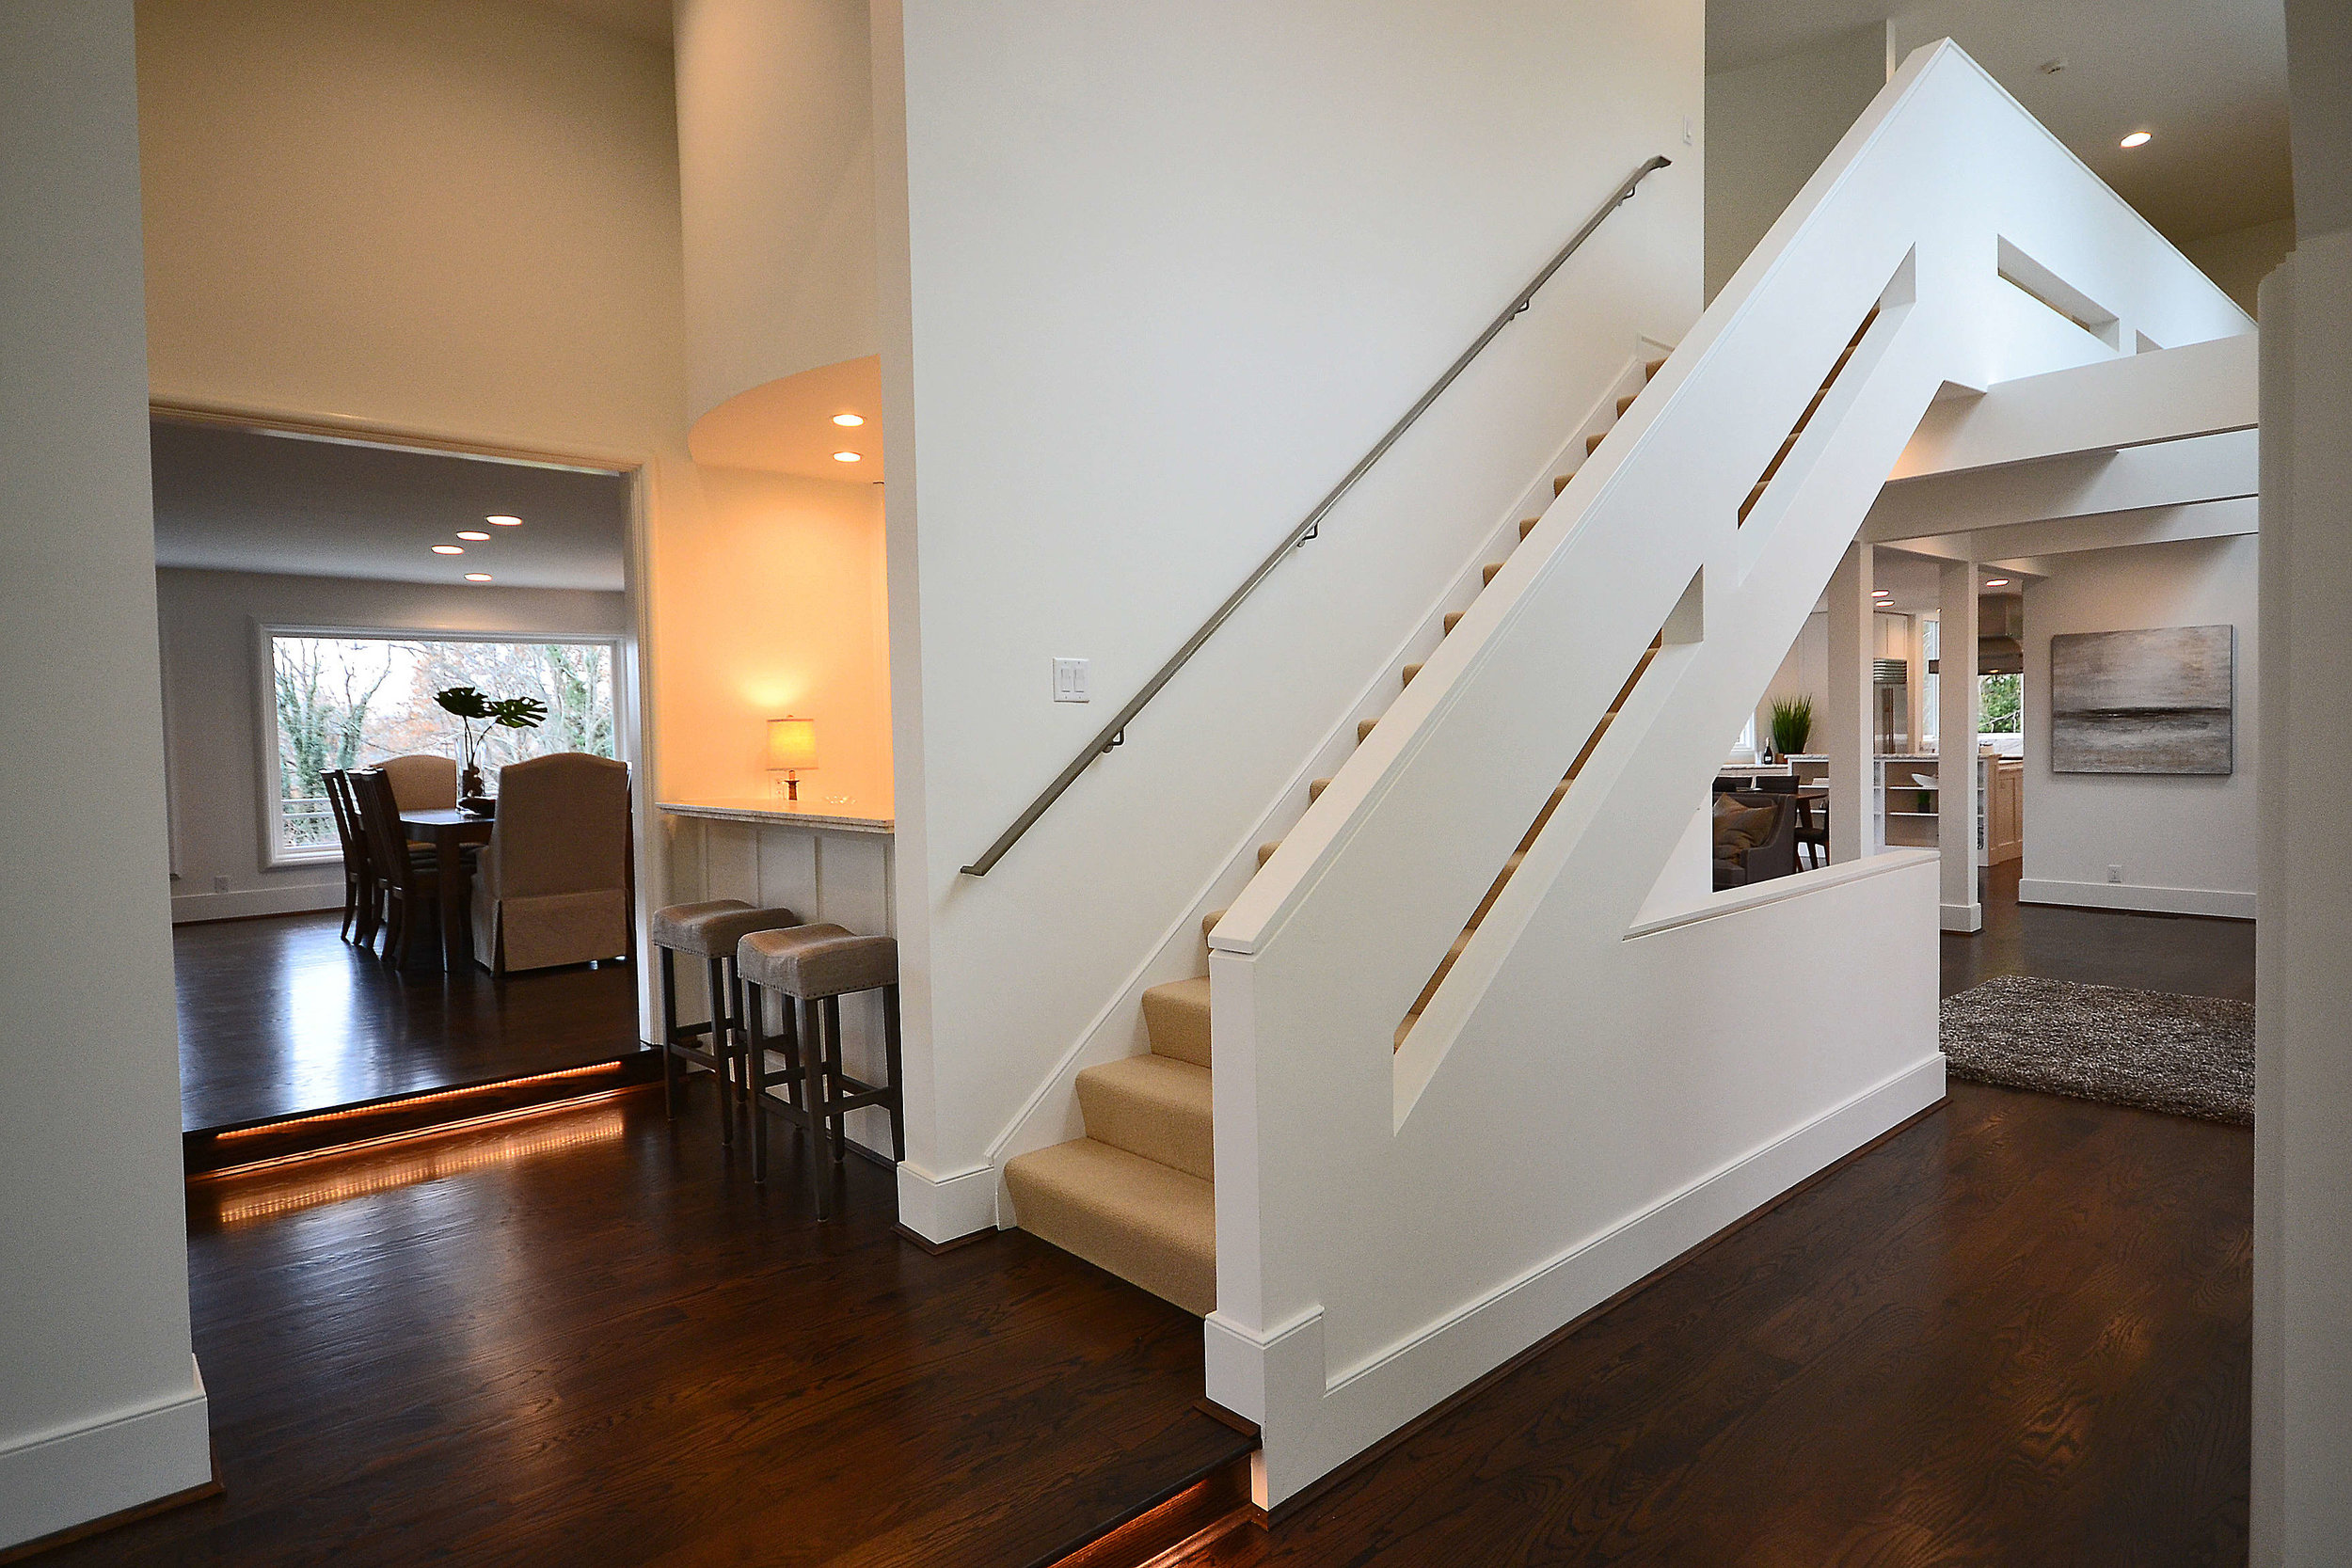 B20 Grandin Stair Detail 2.JPG